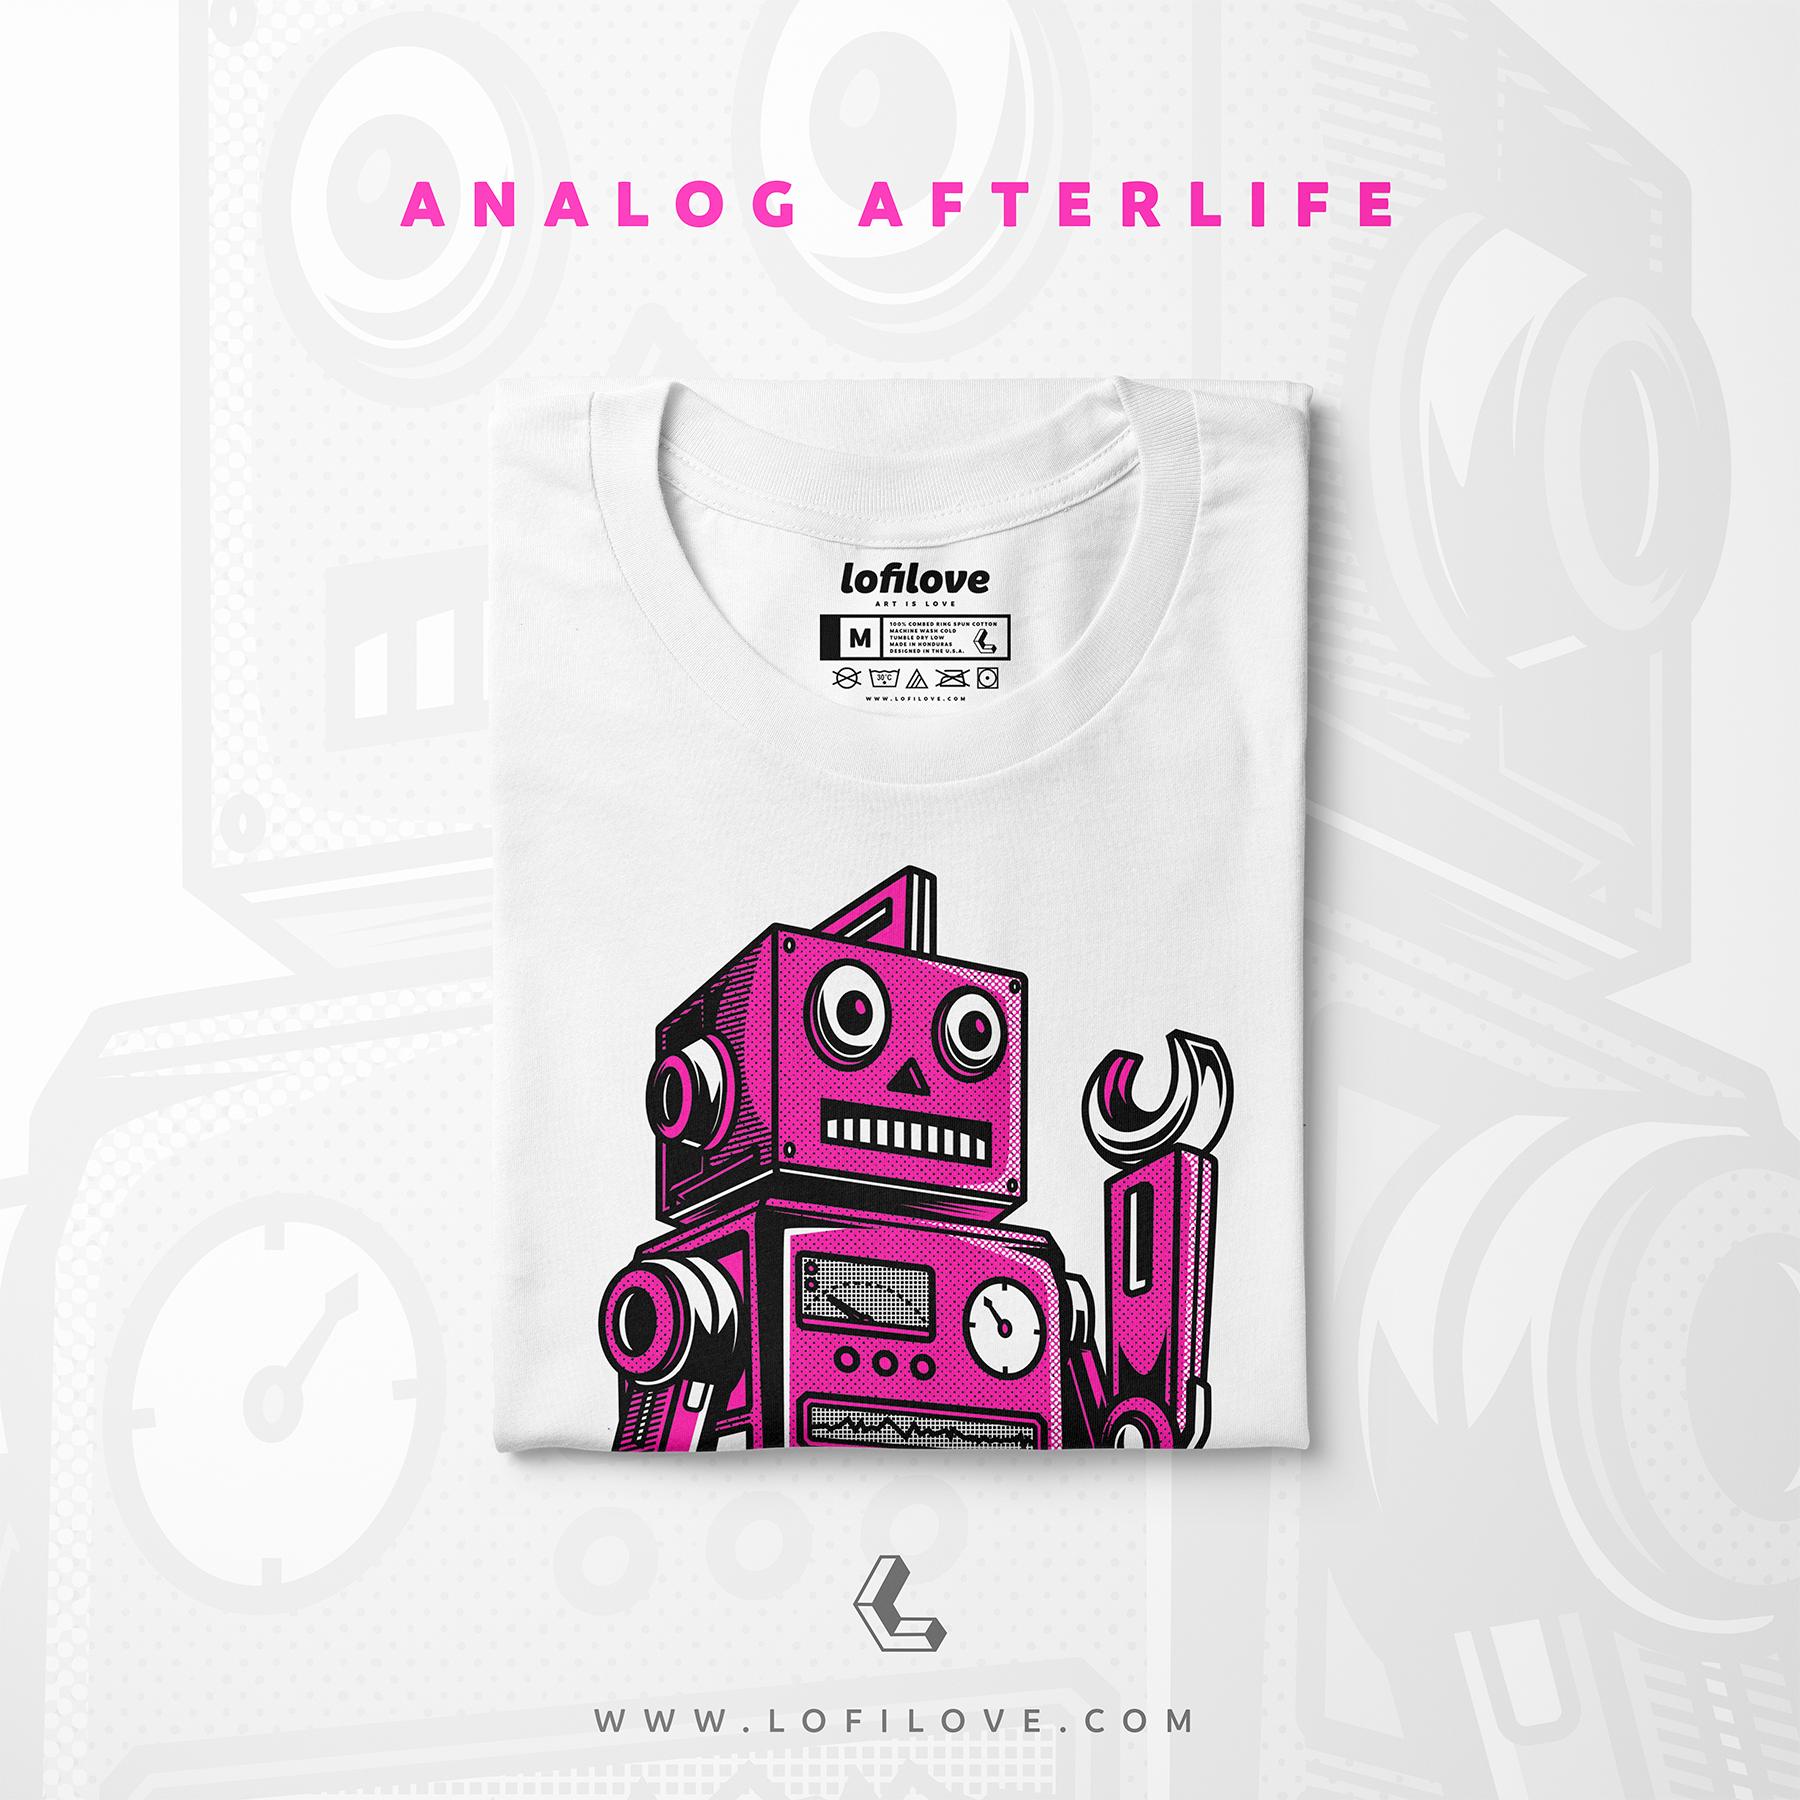 lofilove-analog-afterlife-tee-2